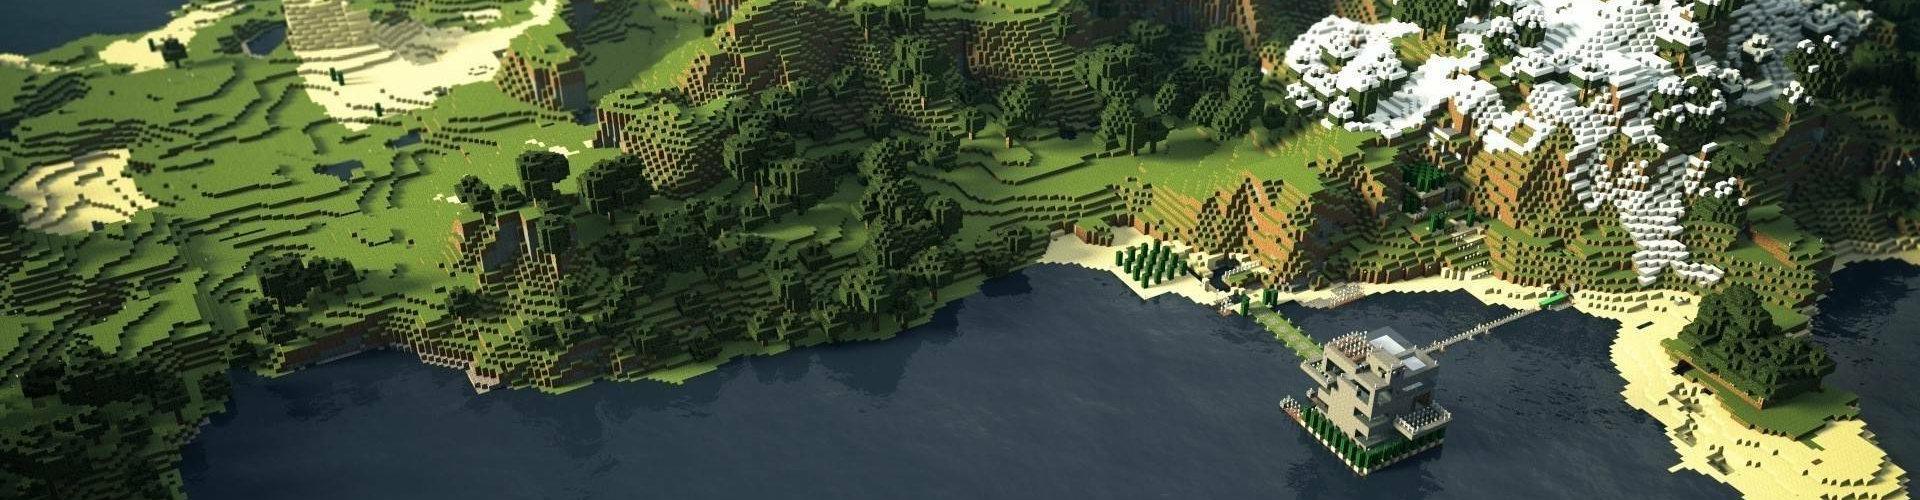 Minecraft аккаунт купить